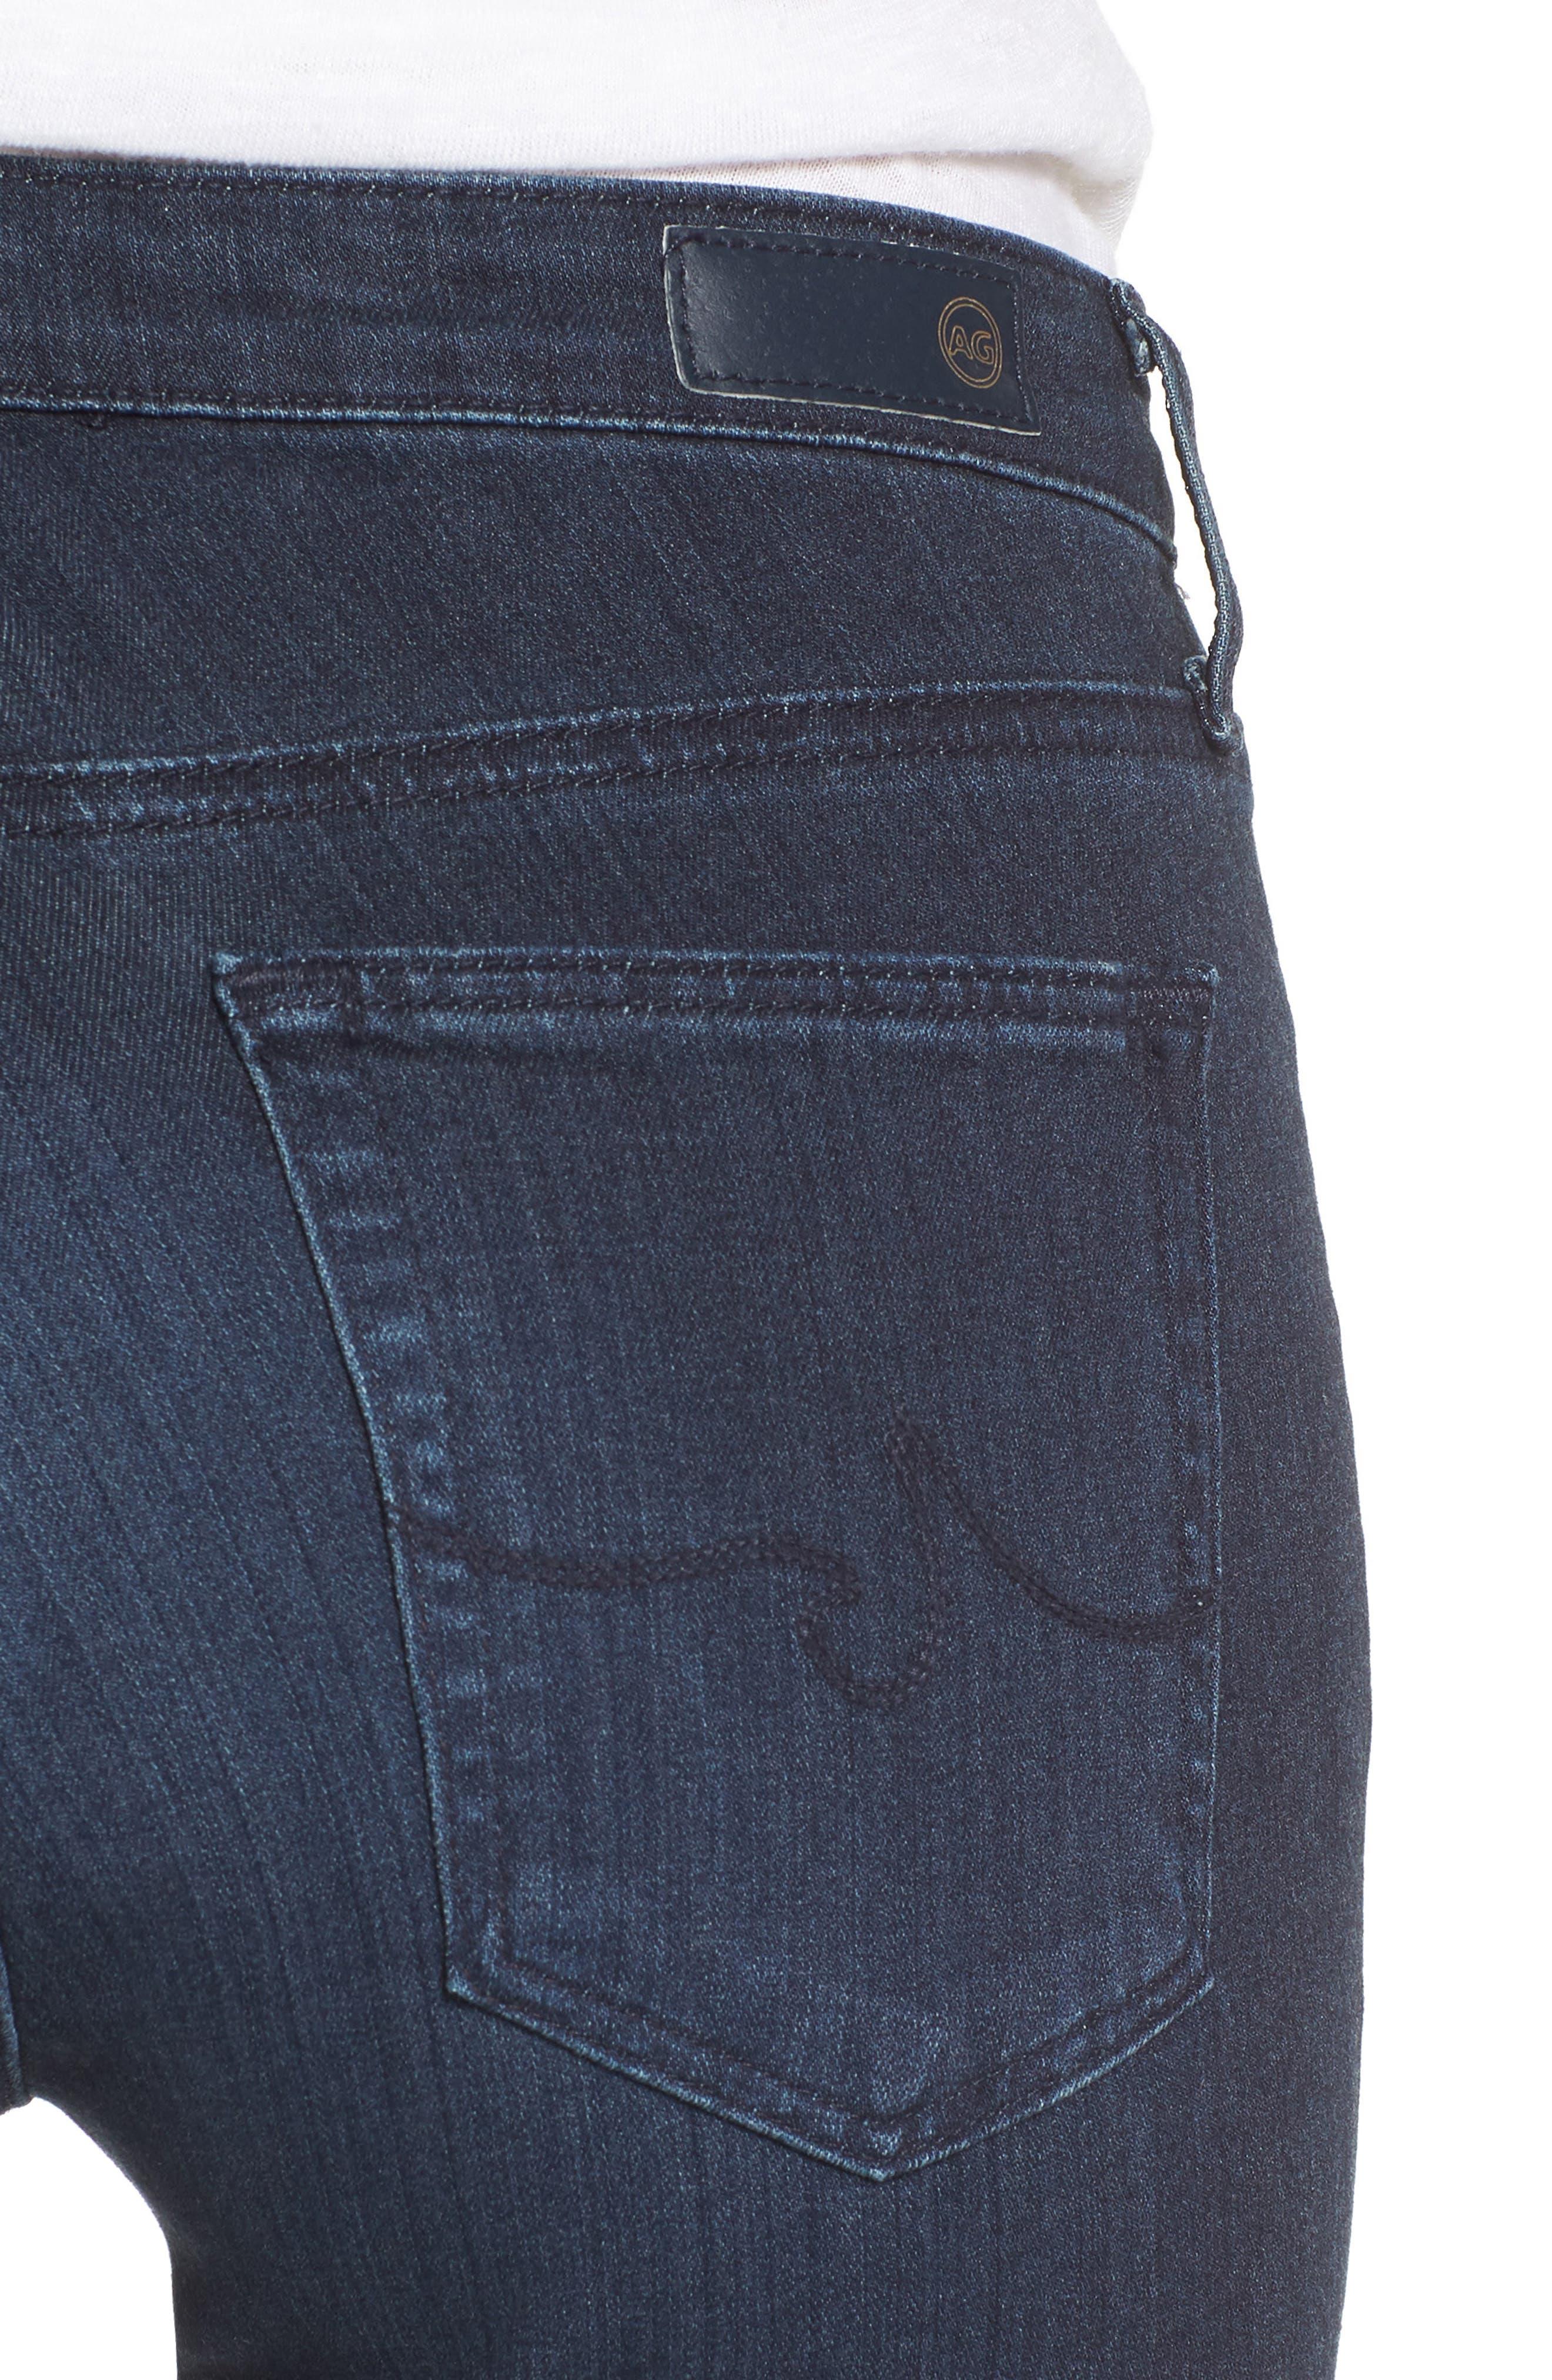 'The Prima' Mid Rise Cigarette Skinny Jeans,                             Alternate thumbnail 4, color,                             GALLANT